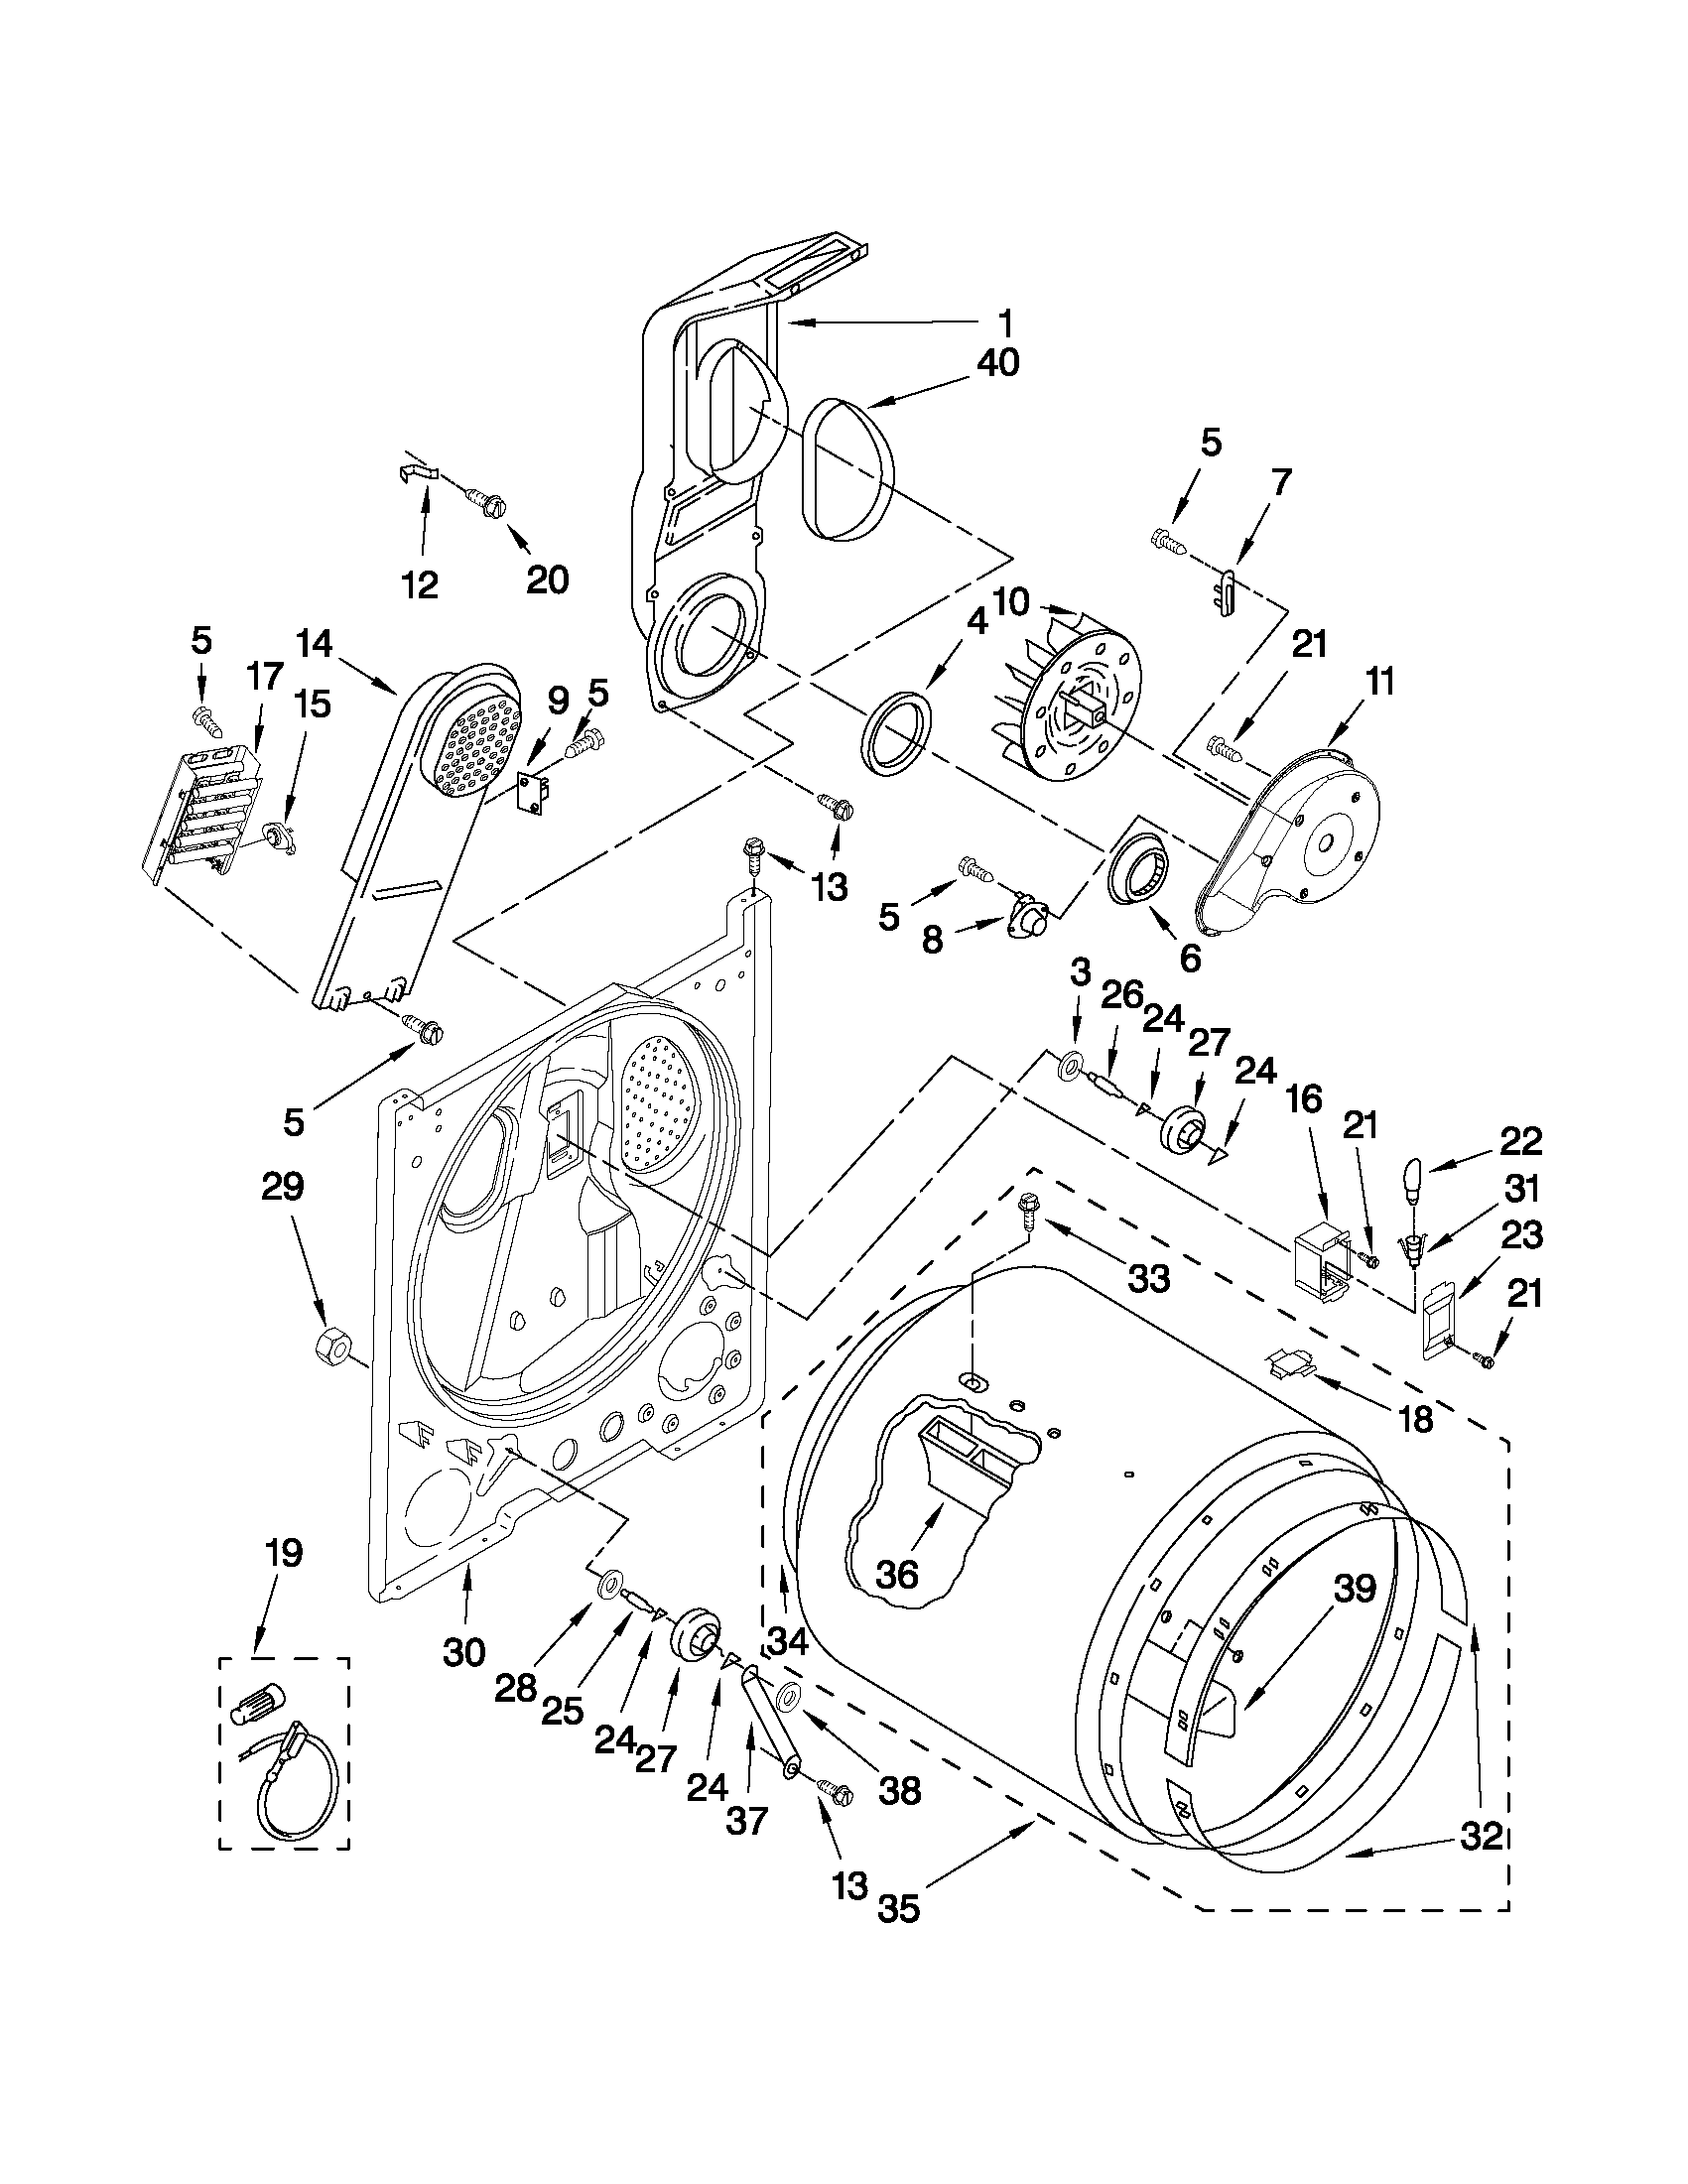 whirlpool dryer model wed4800xq1 manual